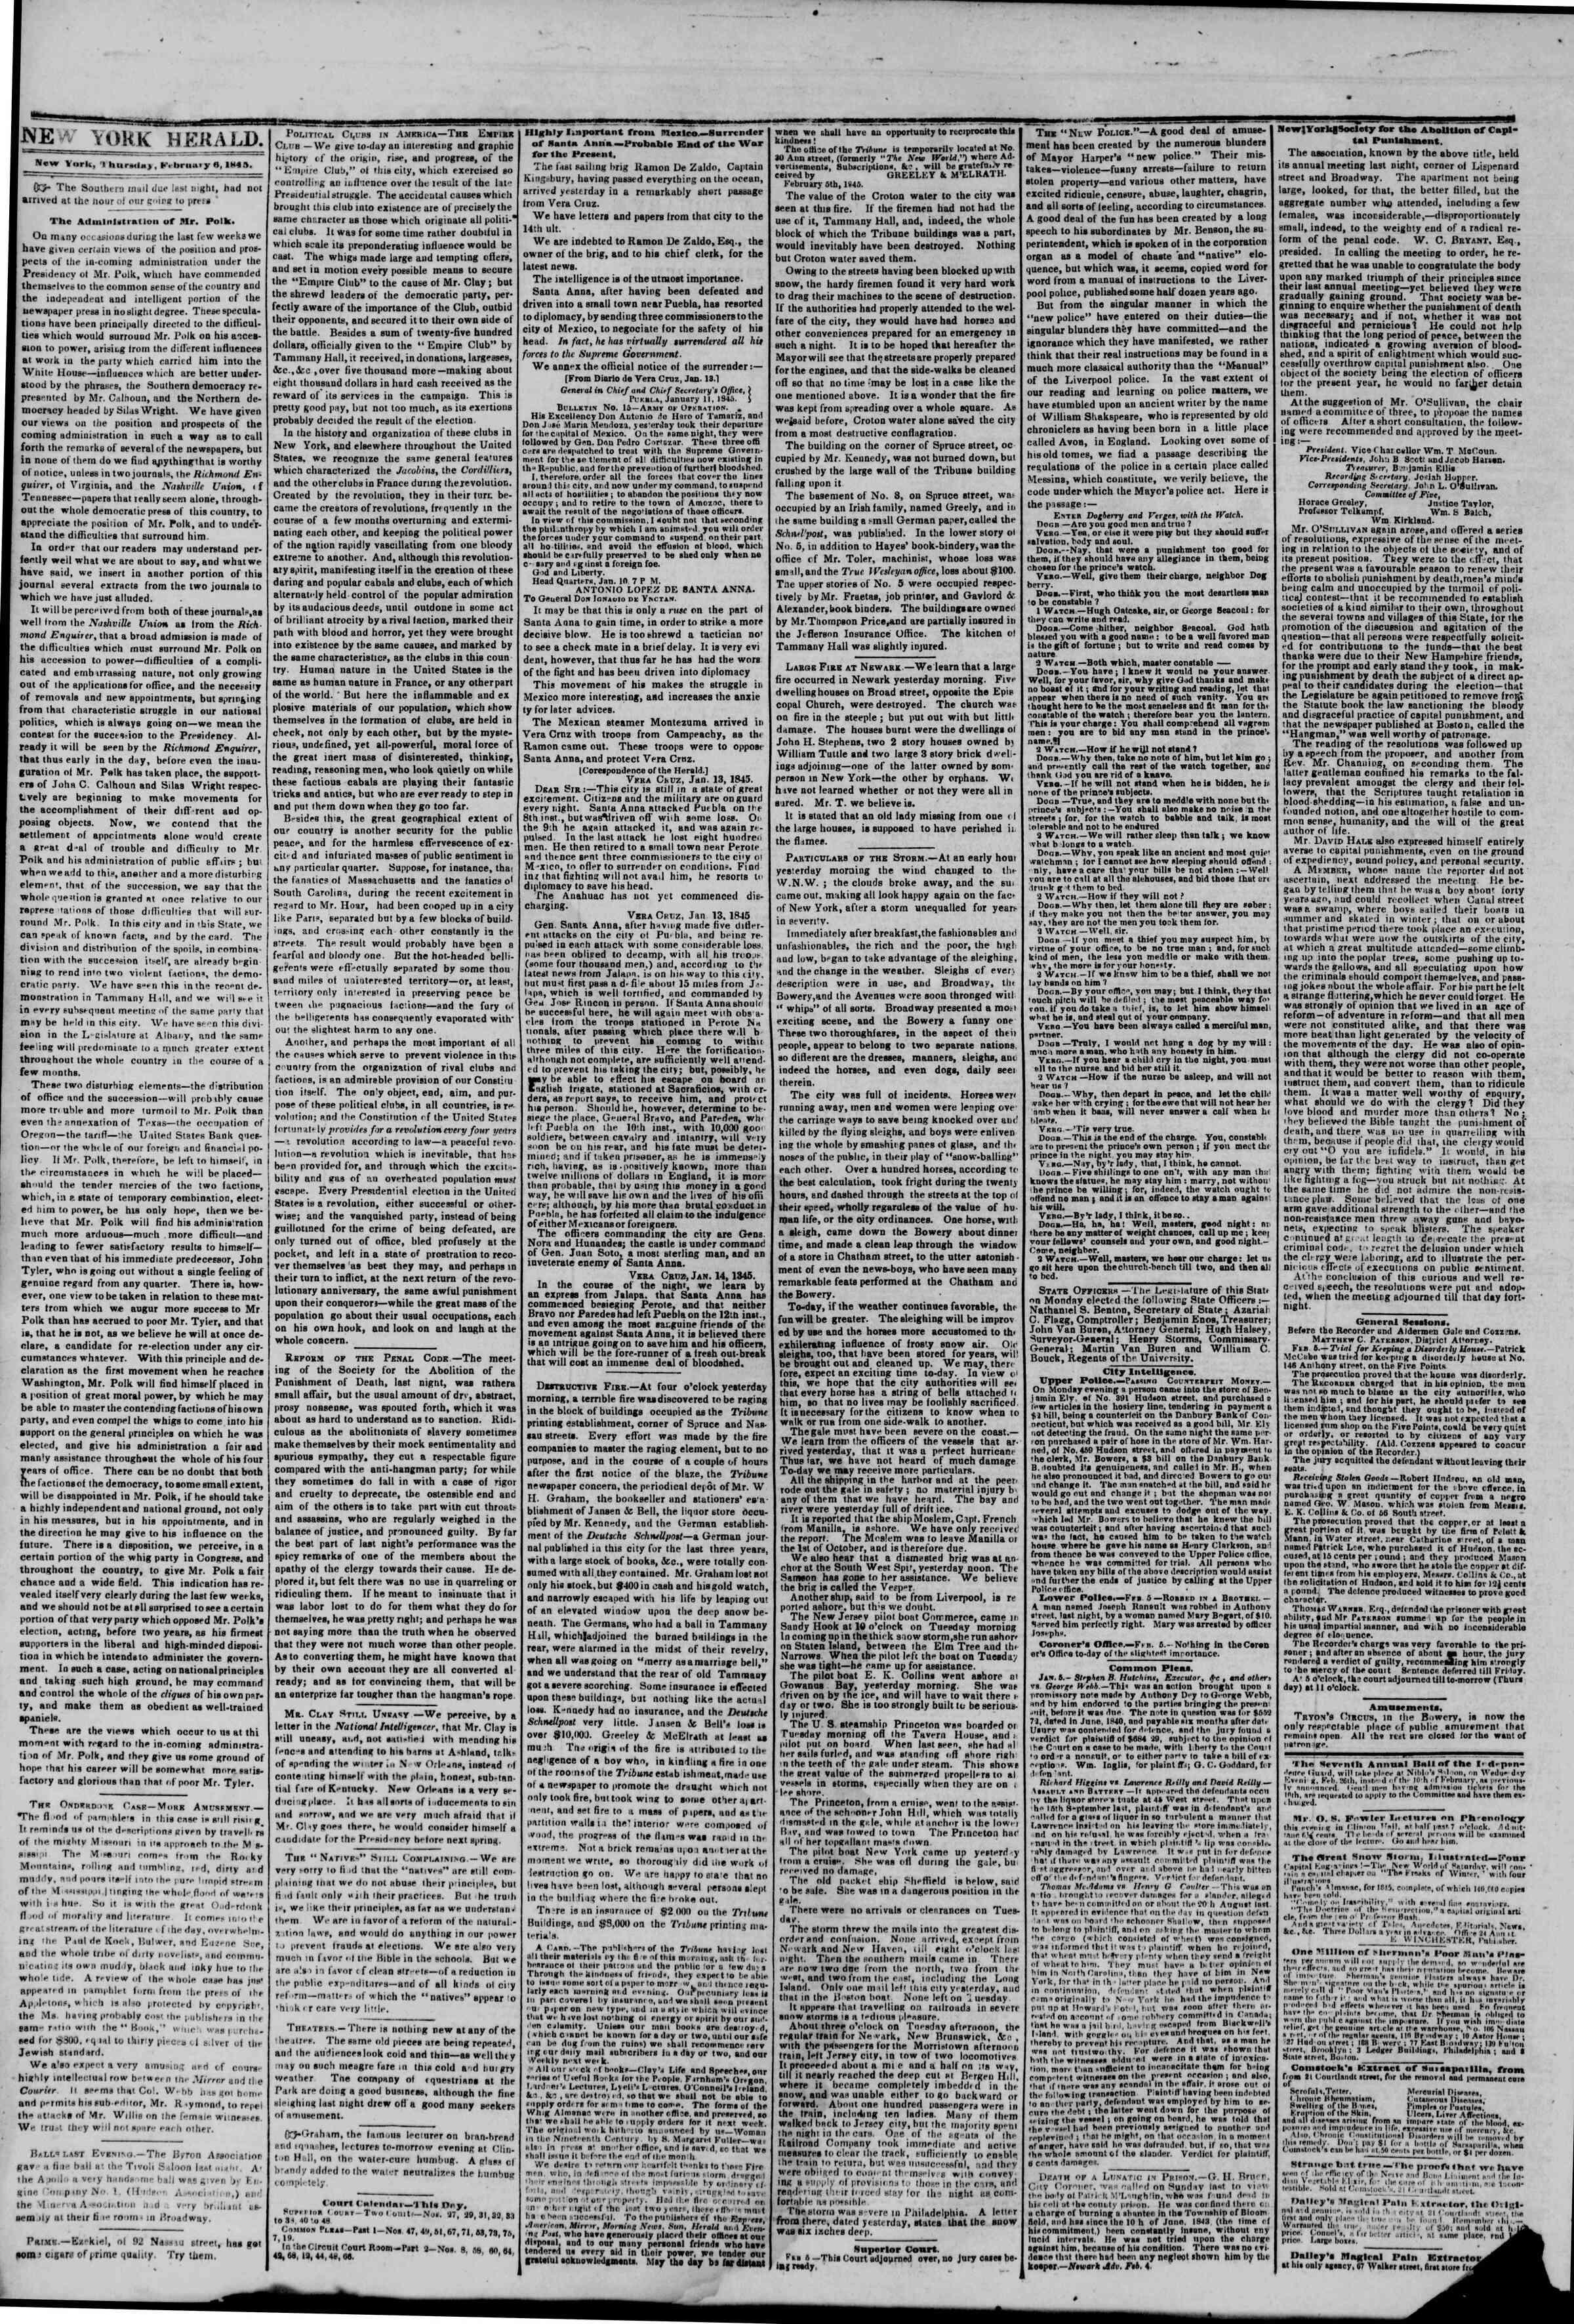 February 6, 1845 Tarihli The New York Herald Gazetesi Sayfa 2